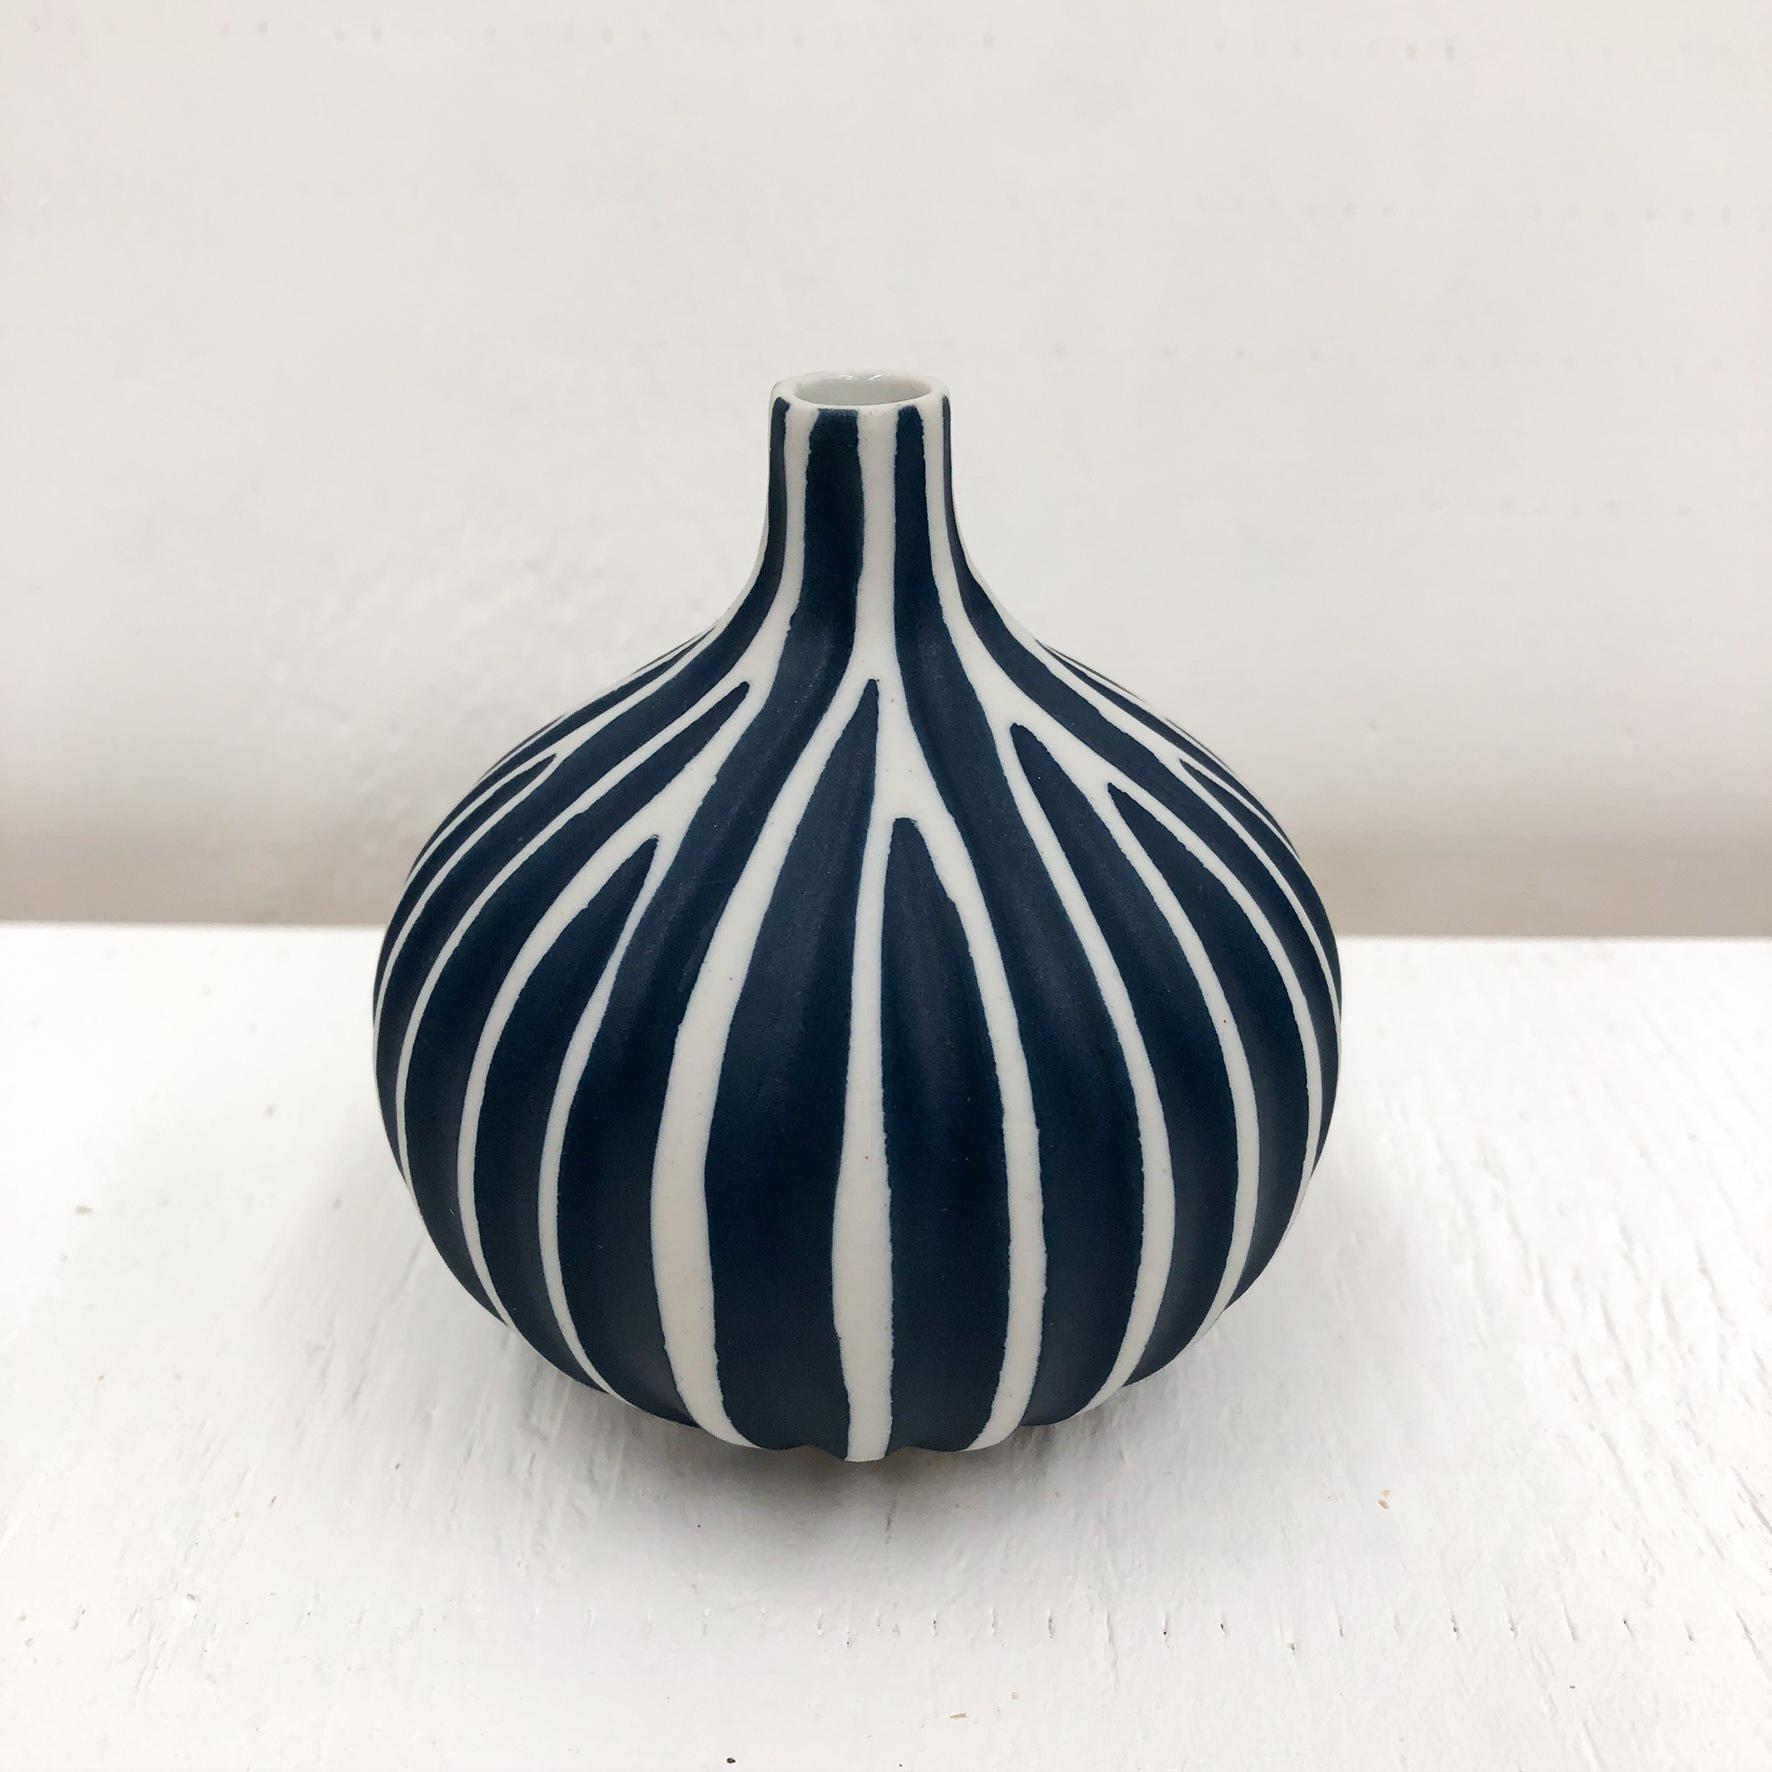 Congo Tiny L Handmade Vase - White & NAvy